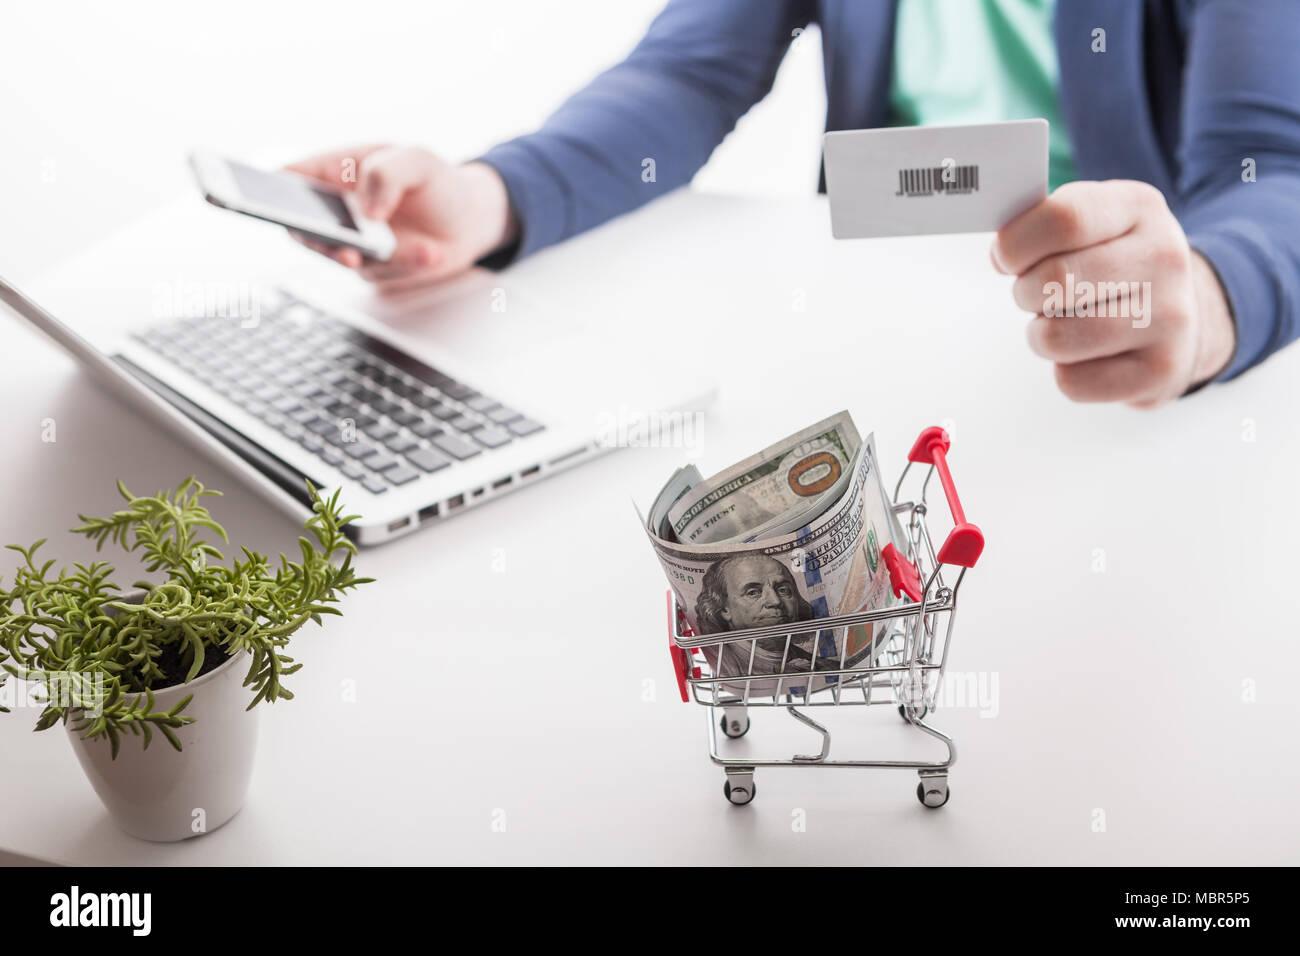 social network diagram as Online shopping concept Stock Photo